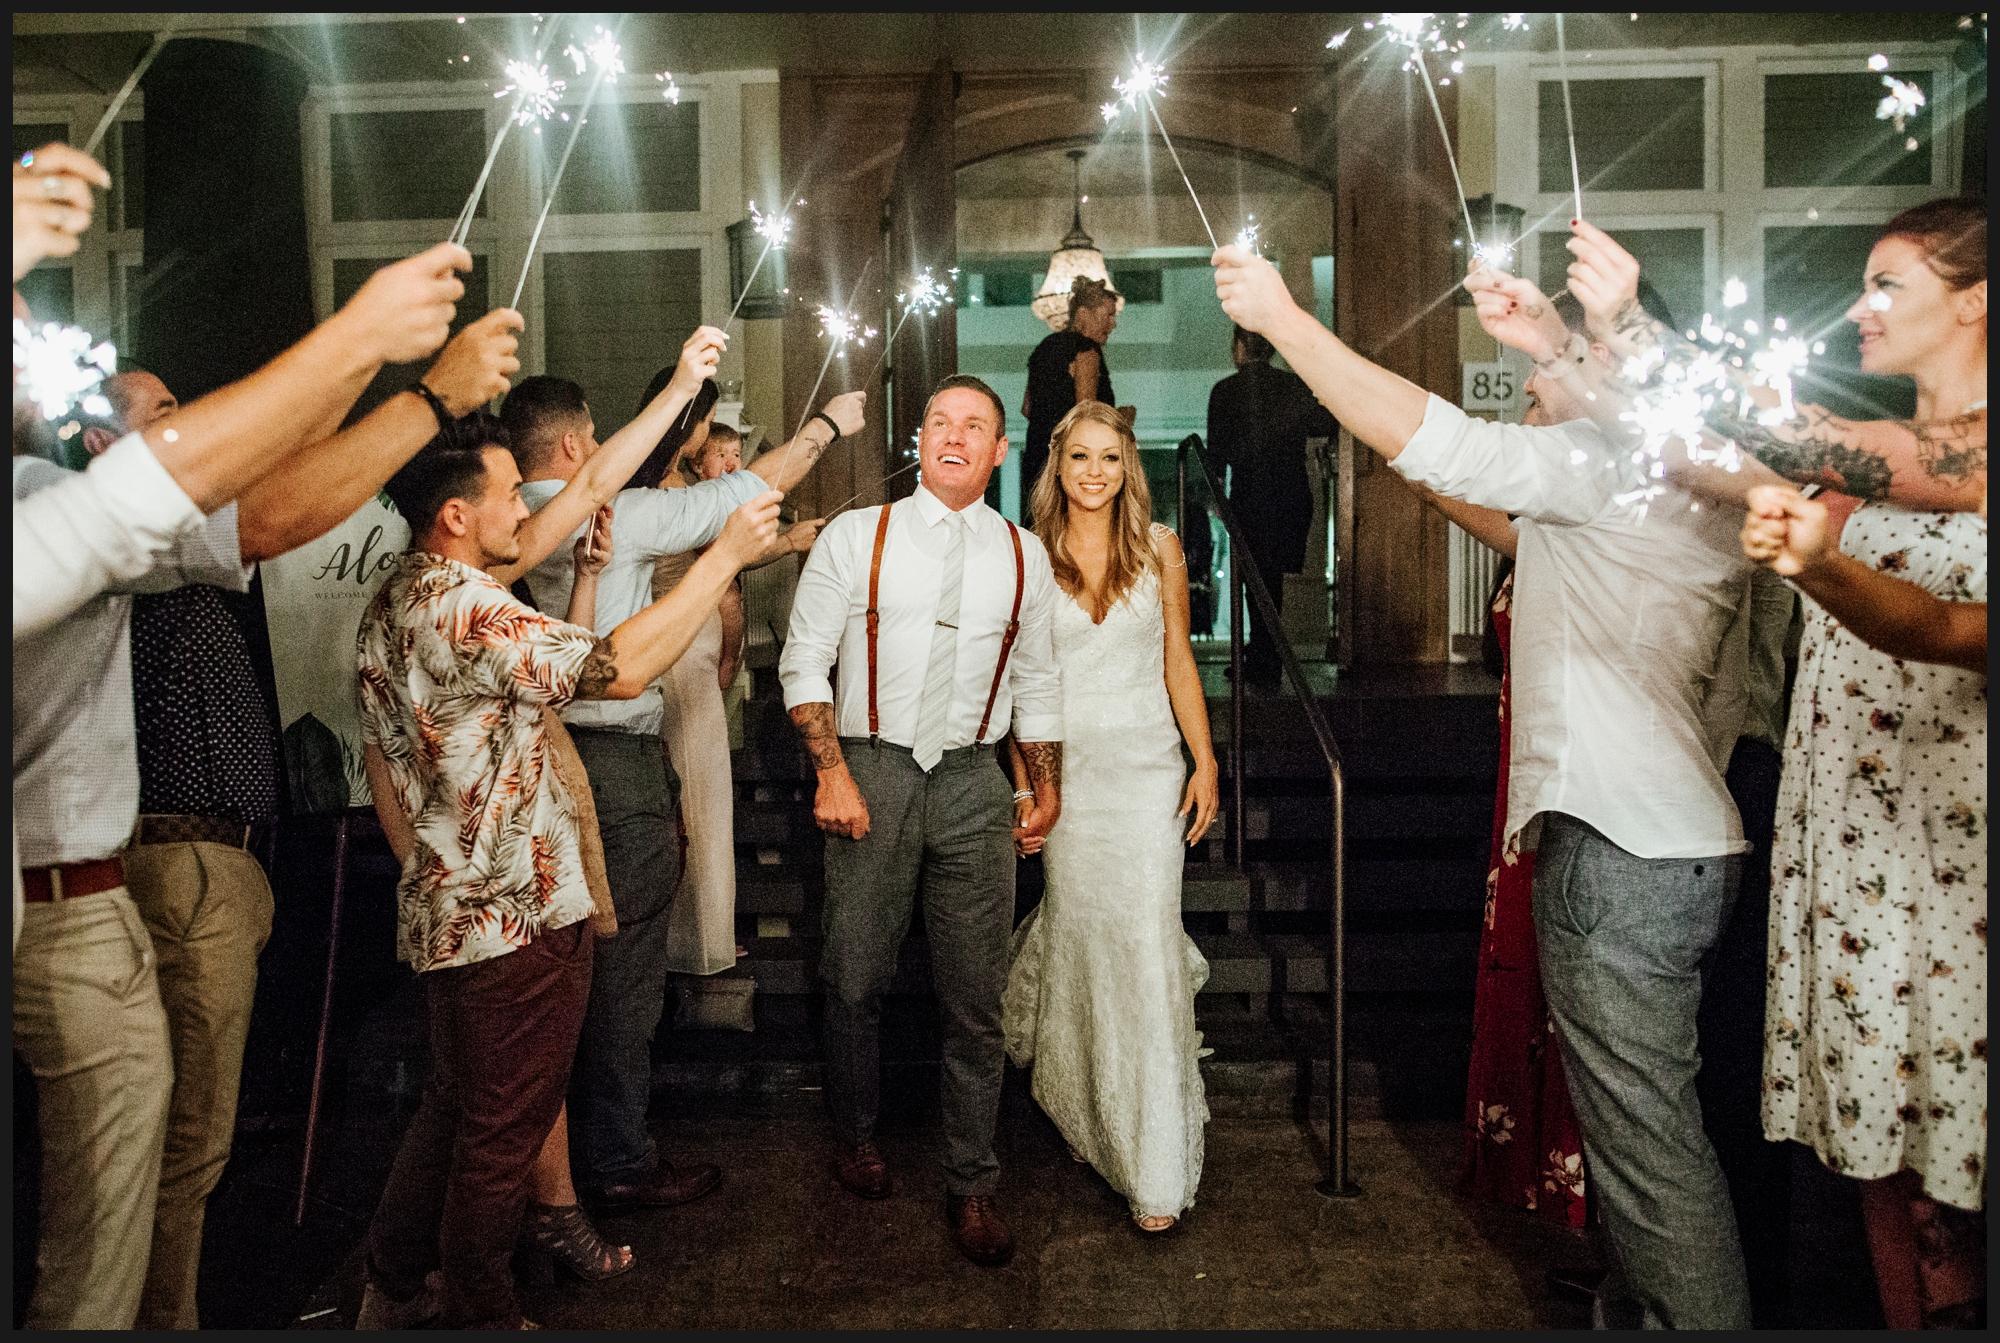 Orlando-Wedding-Photographer-destination-wedding-photographer-florida-wedding-photographer-hawaii-wedding-photographer_0099.jpg